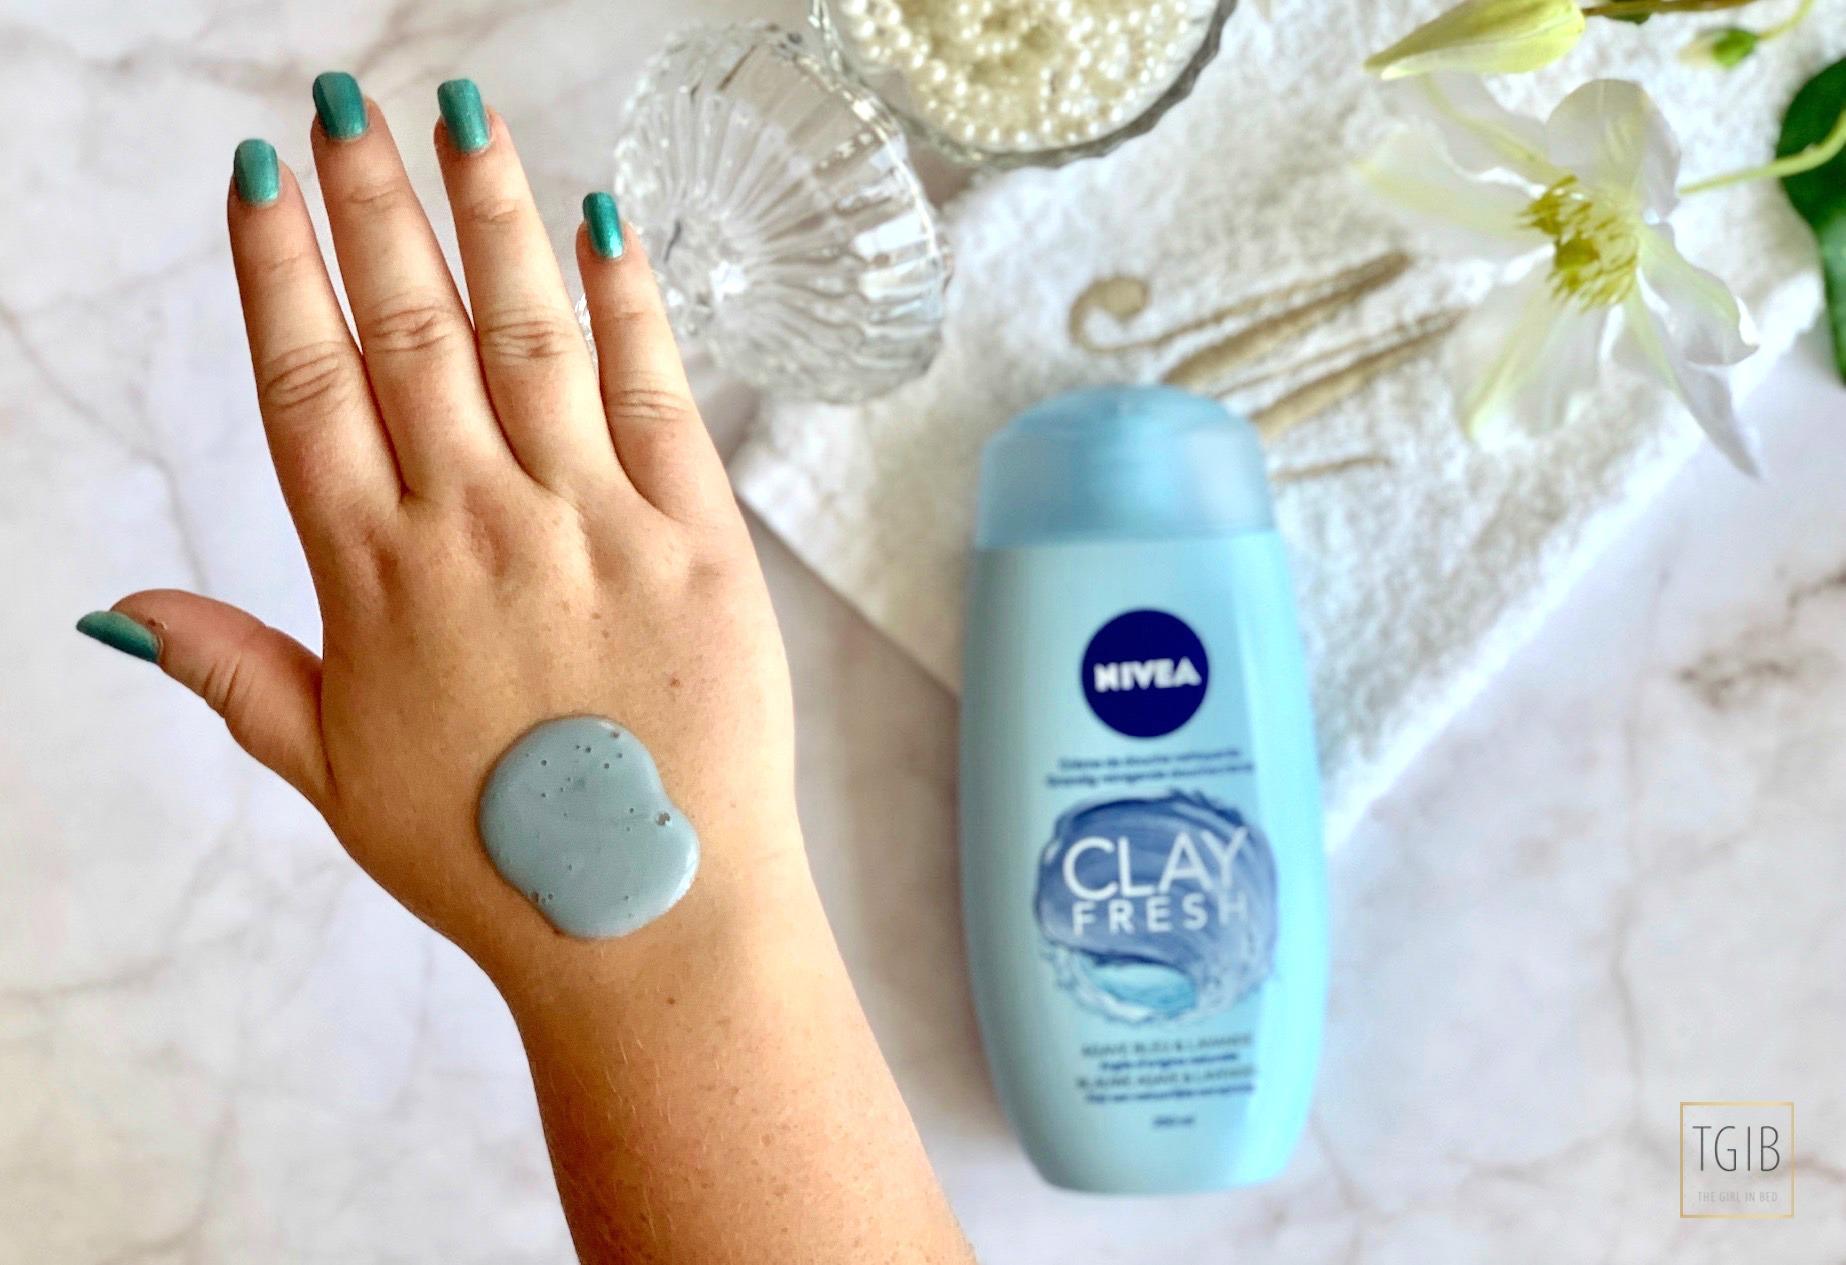 Nivea Clay Fresh Blauwe Agave & Lavendel